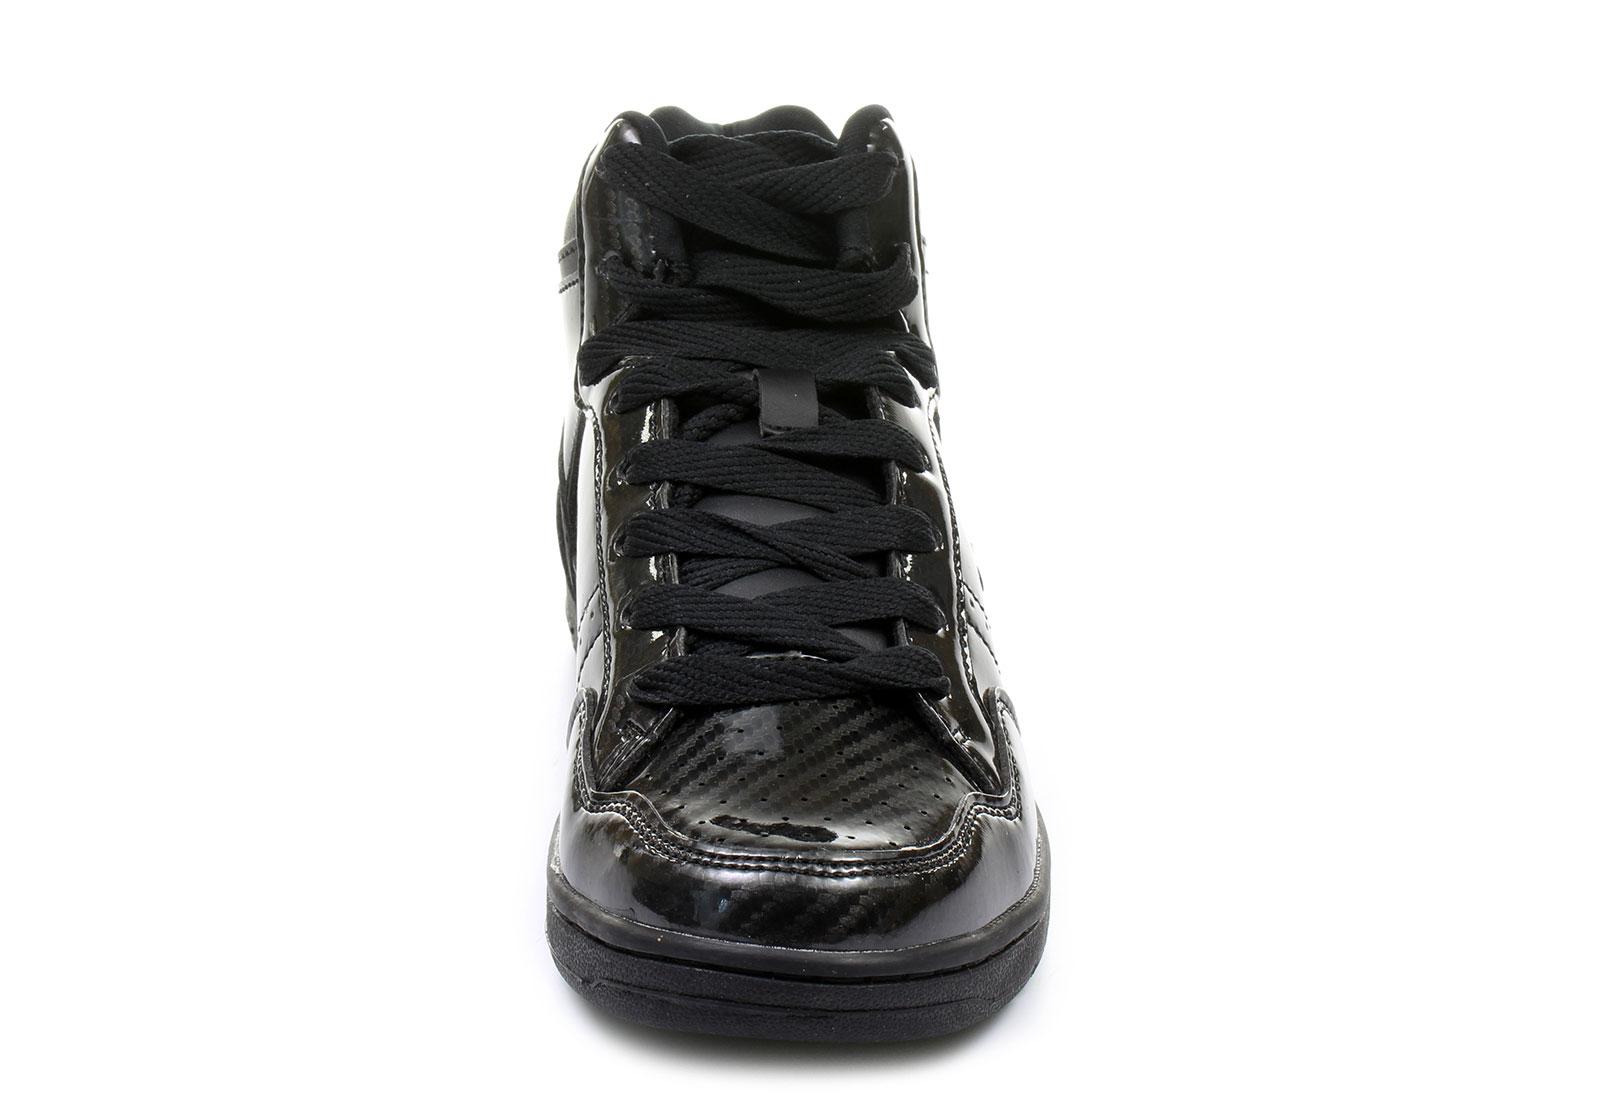 Ellesse Shoes Zina Eli163250 01 Online Shop For